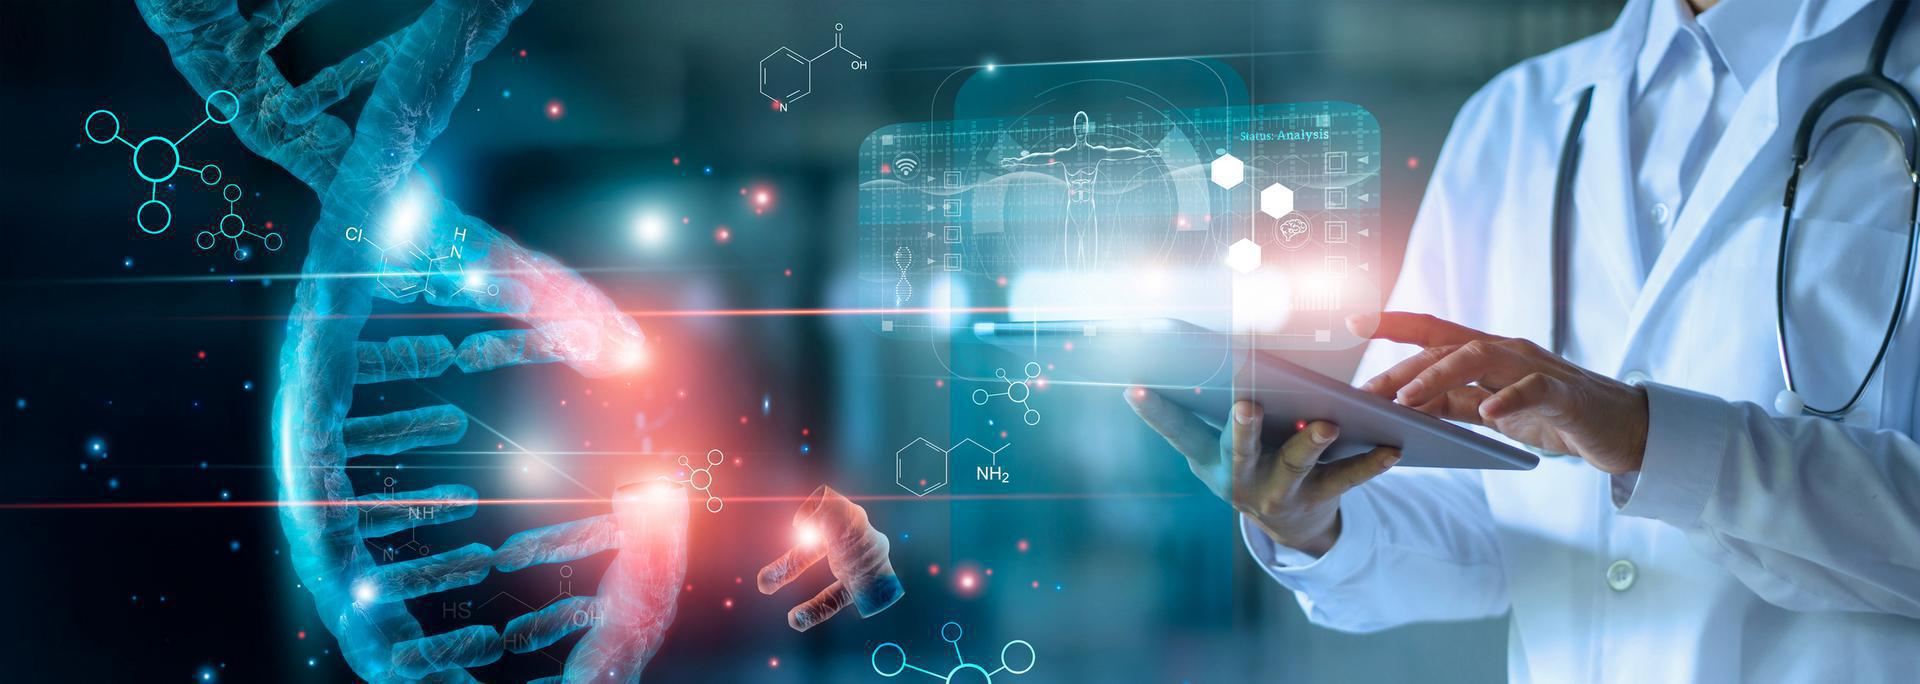 Drug Testing and DNA Testing - Fairbury NE - featured